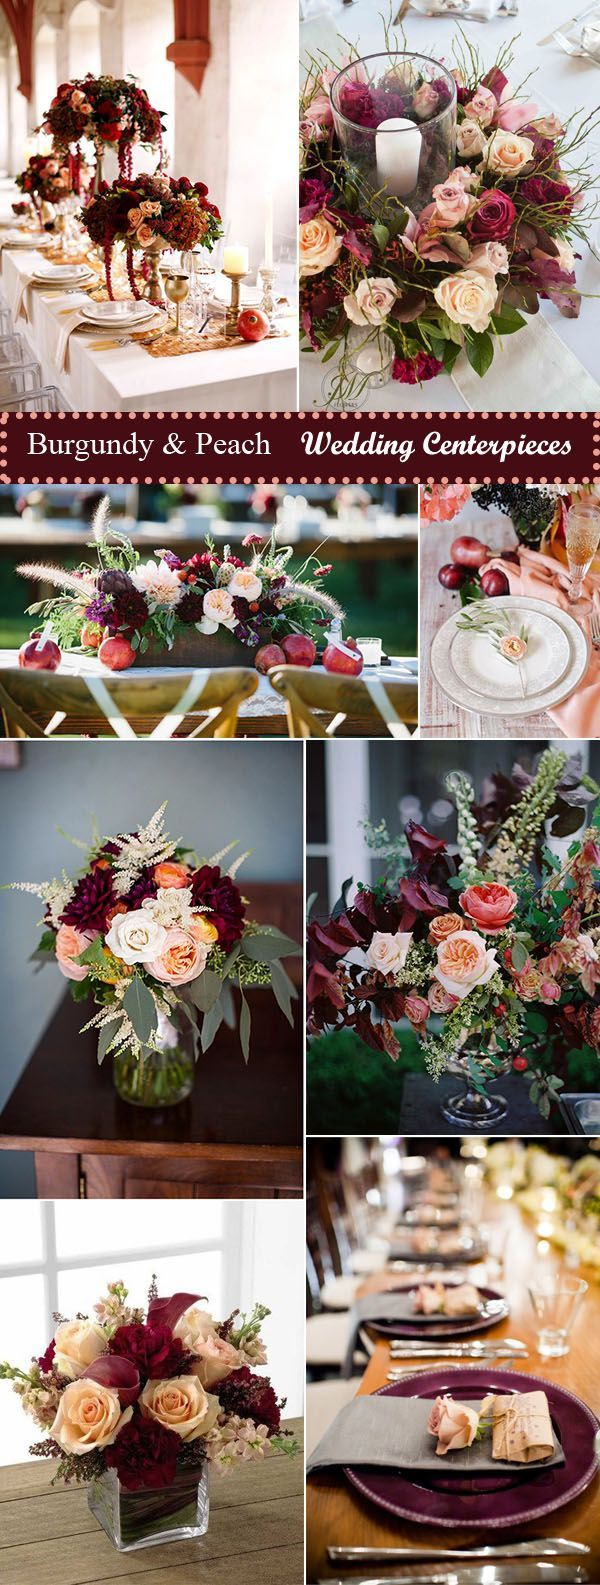 Best 25 burgundy decor ideas on pinterest blush wine for Burgundy wedding reception decorations